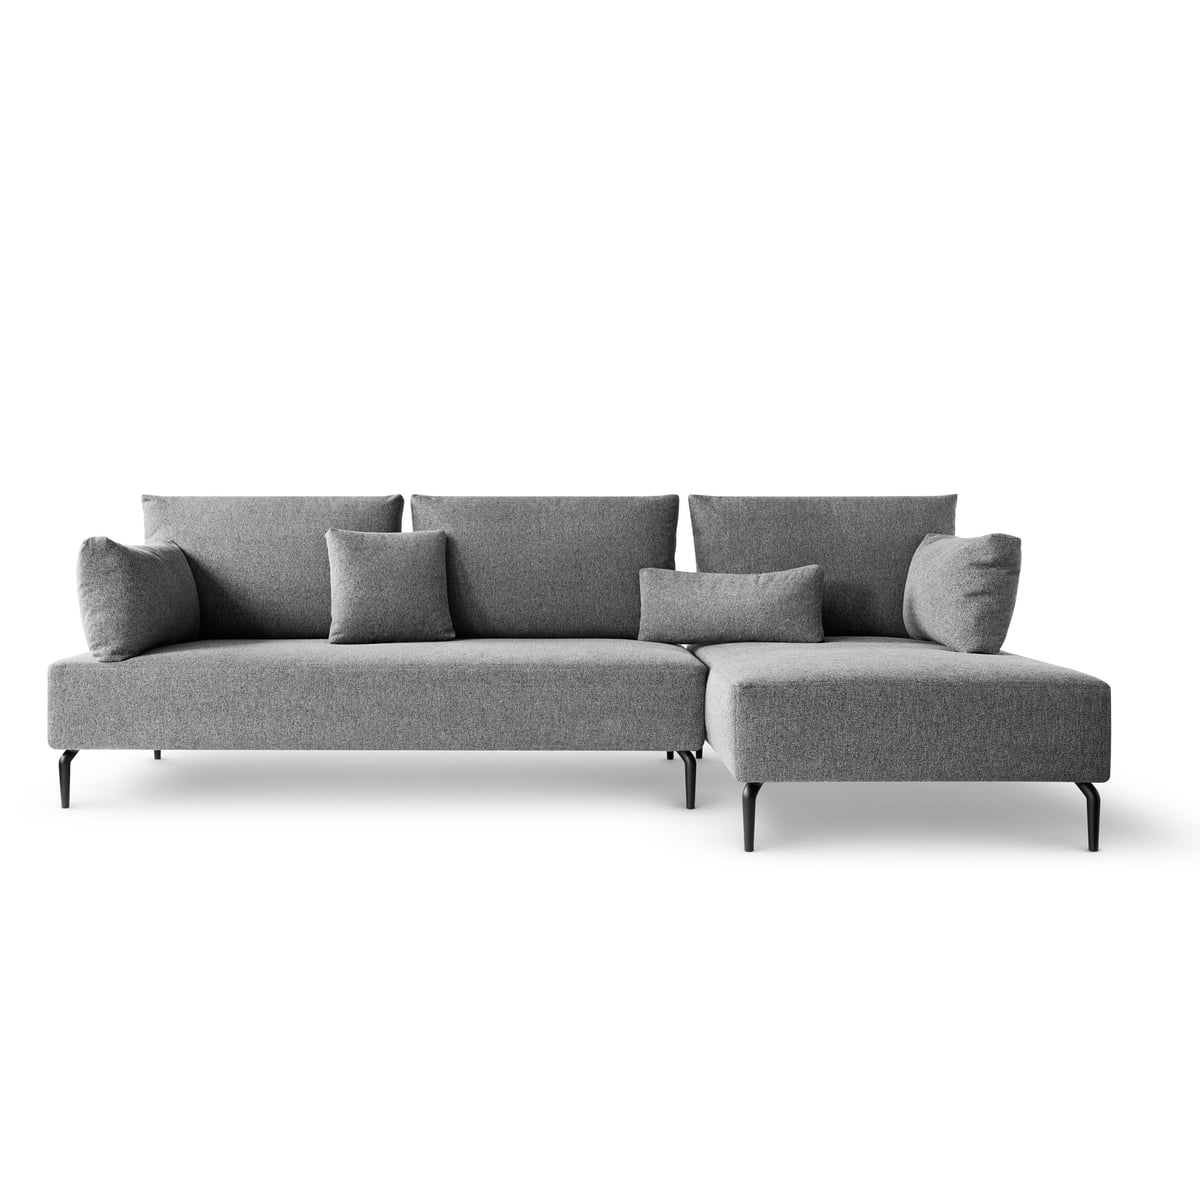 Outstanding Eva Solo Yoga Modulares Sofa Chaise Longue Rechts Dailytribune Chair Design For Home Dailytribuneorg